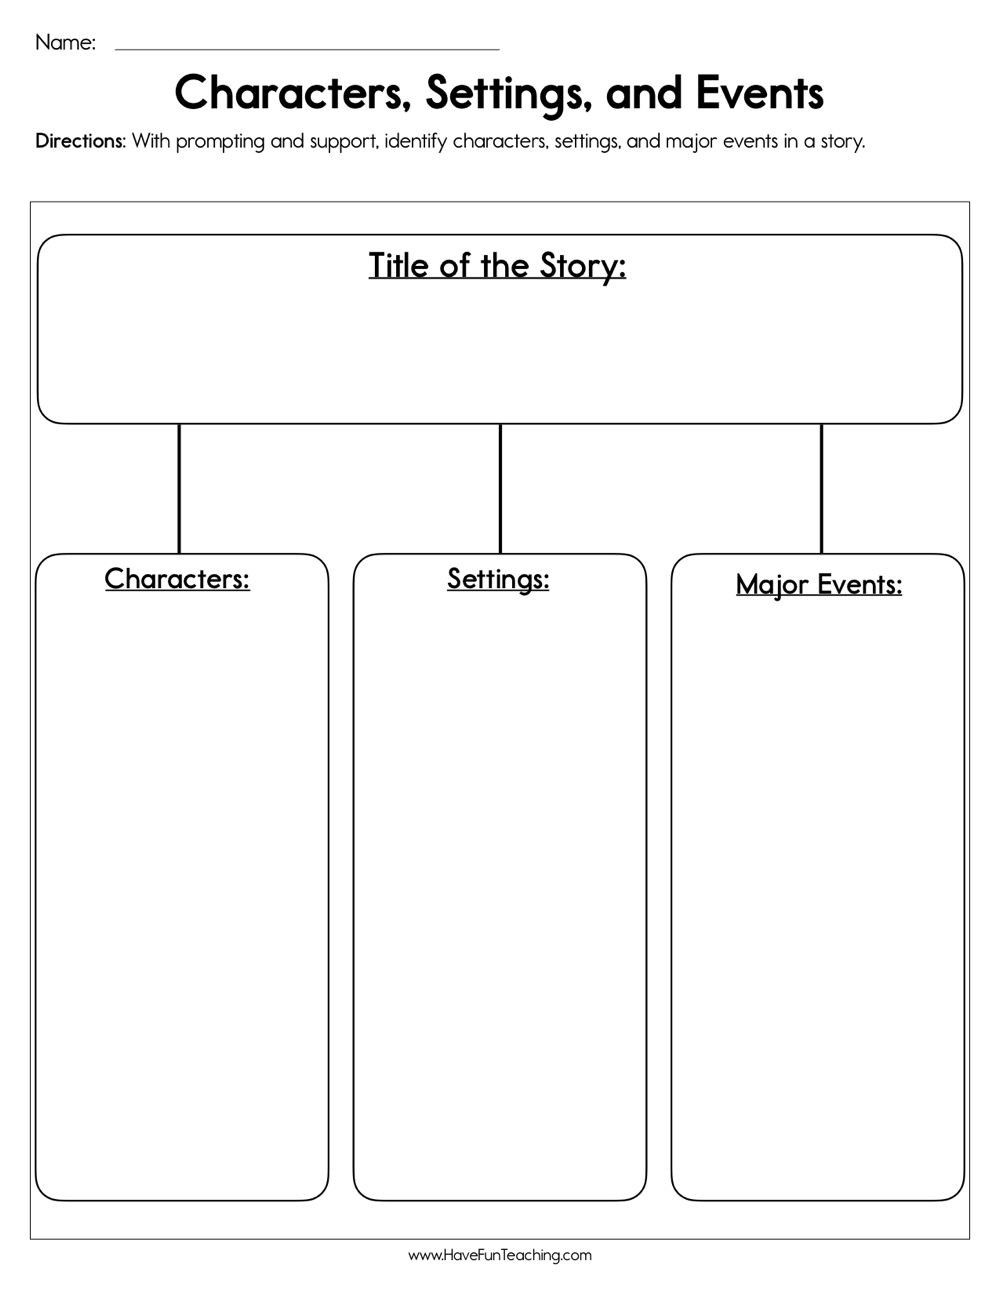 Character Worksheets For Kindergarten Worksheet For Kindergarten Character Worksheets Story Elements Worksheet Have Fun Teaching [ 1294 x 1000 Pixel ]